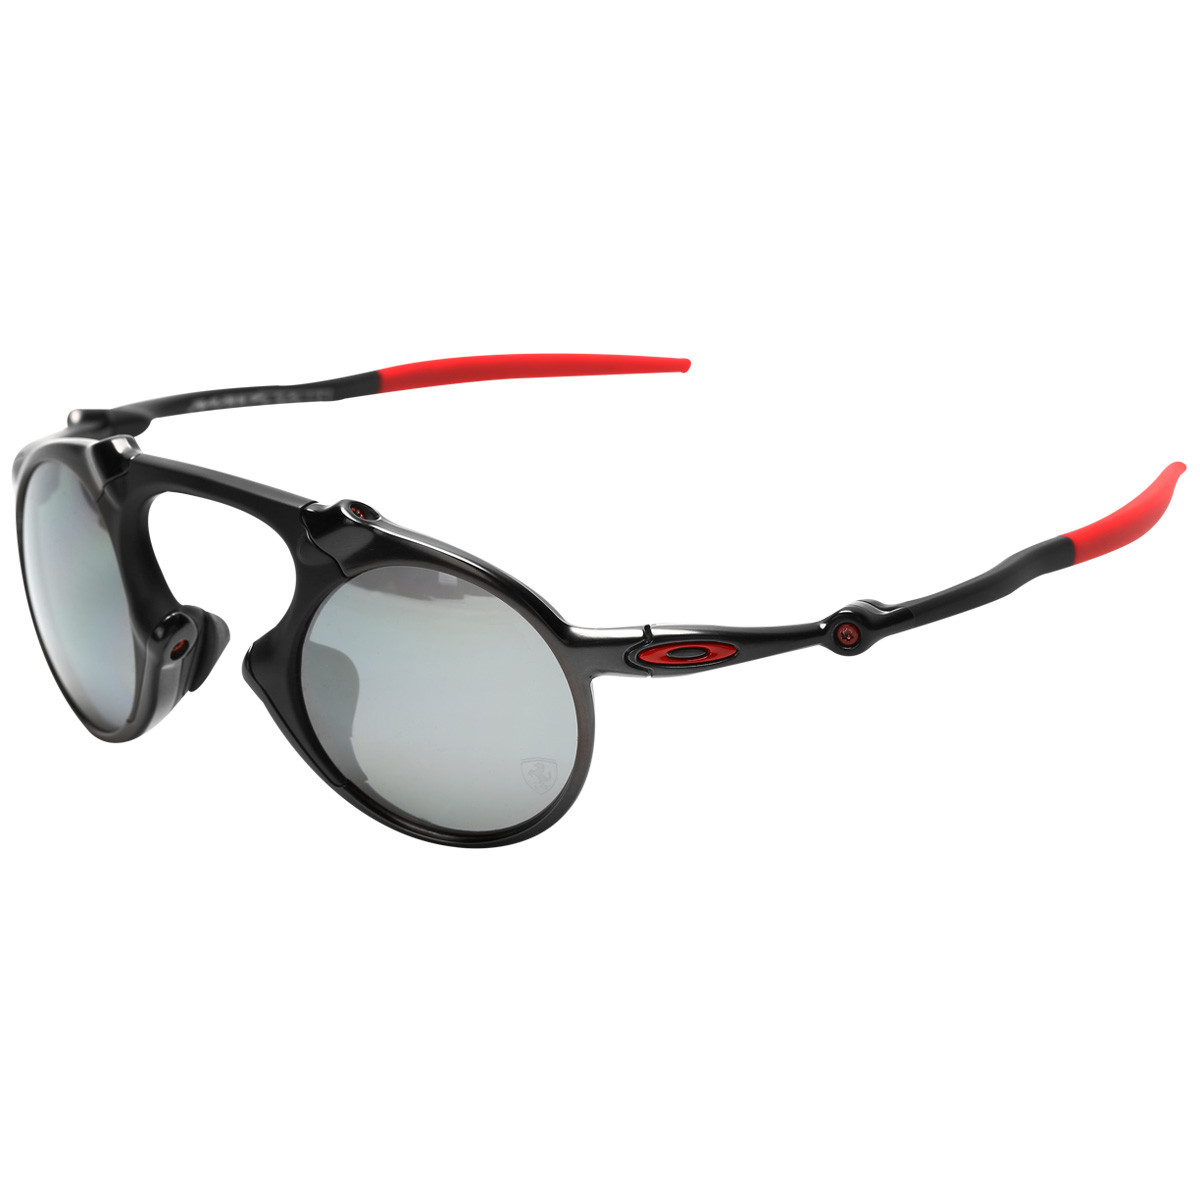 7da78d99303f5 Óculos Oakley Madman Ferrari Edition Dark Carbon Lente Black Iridium  Polarizado